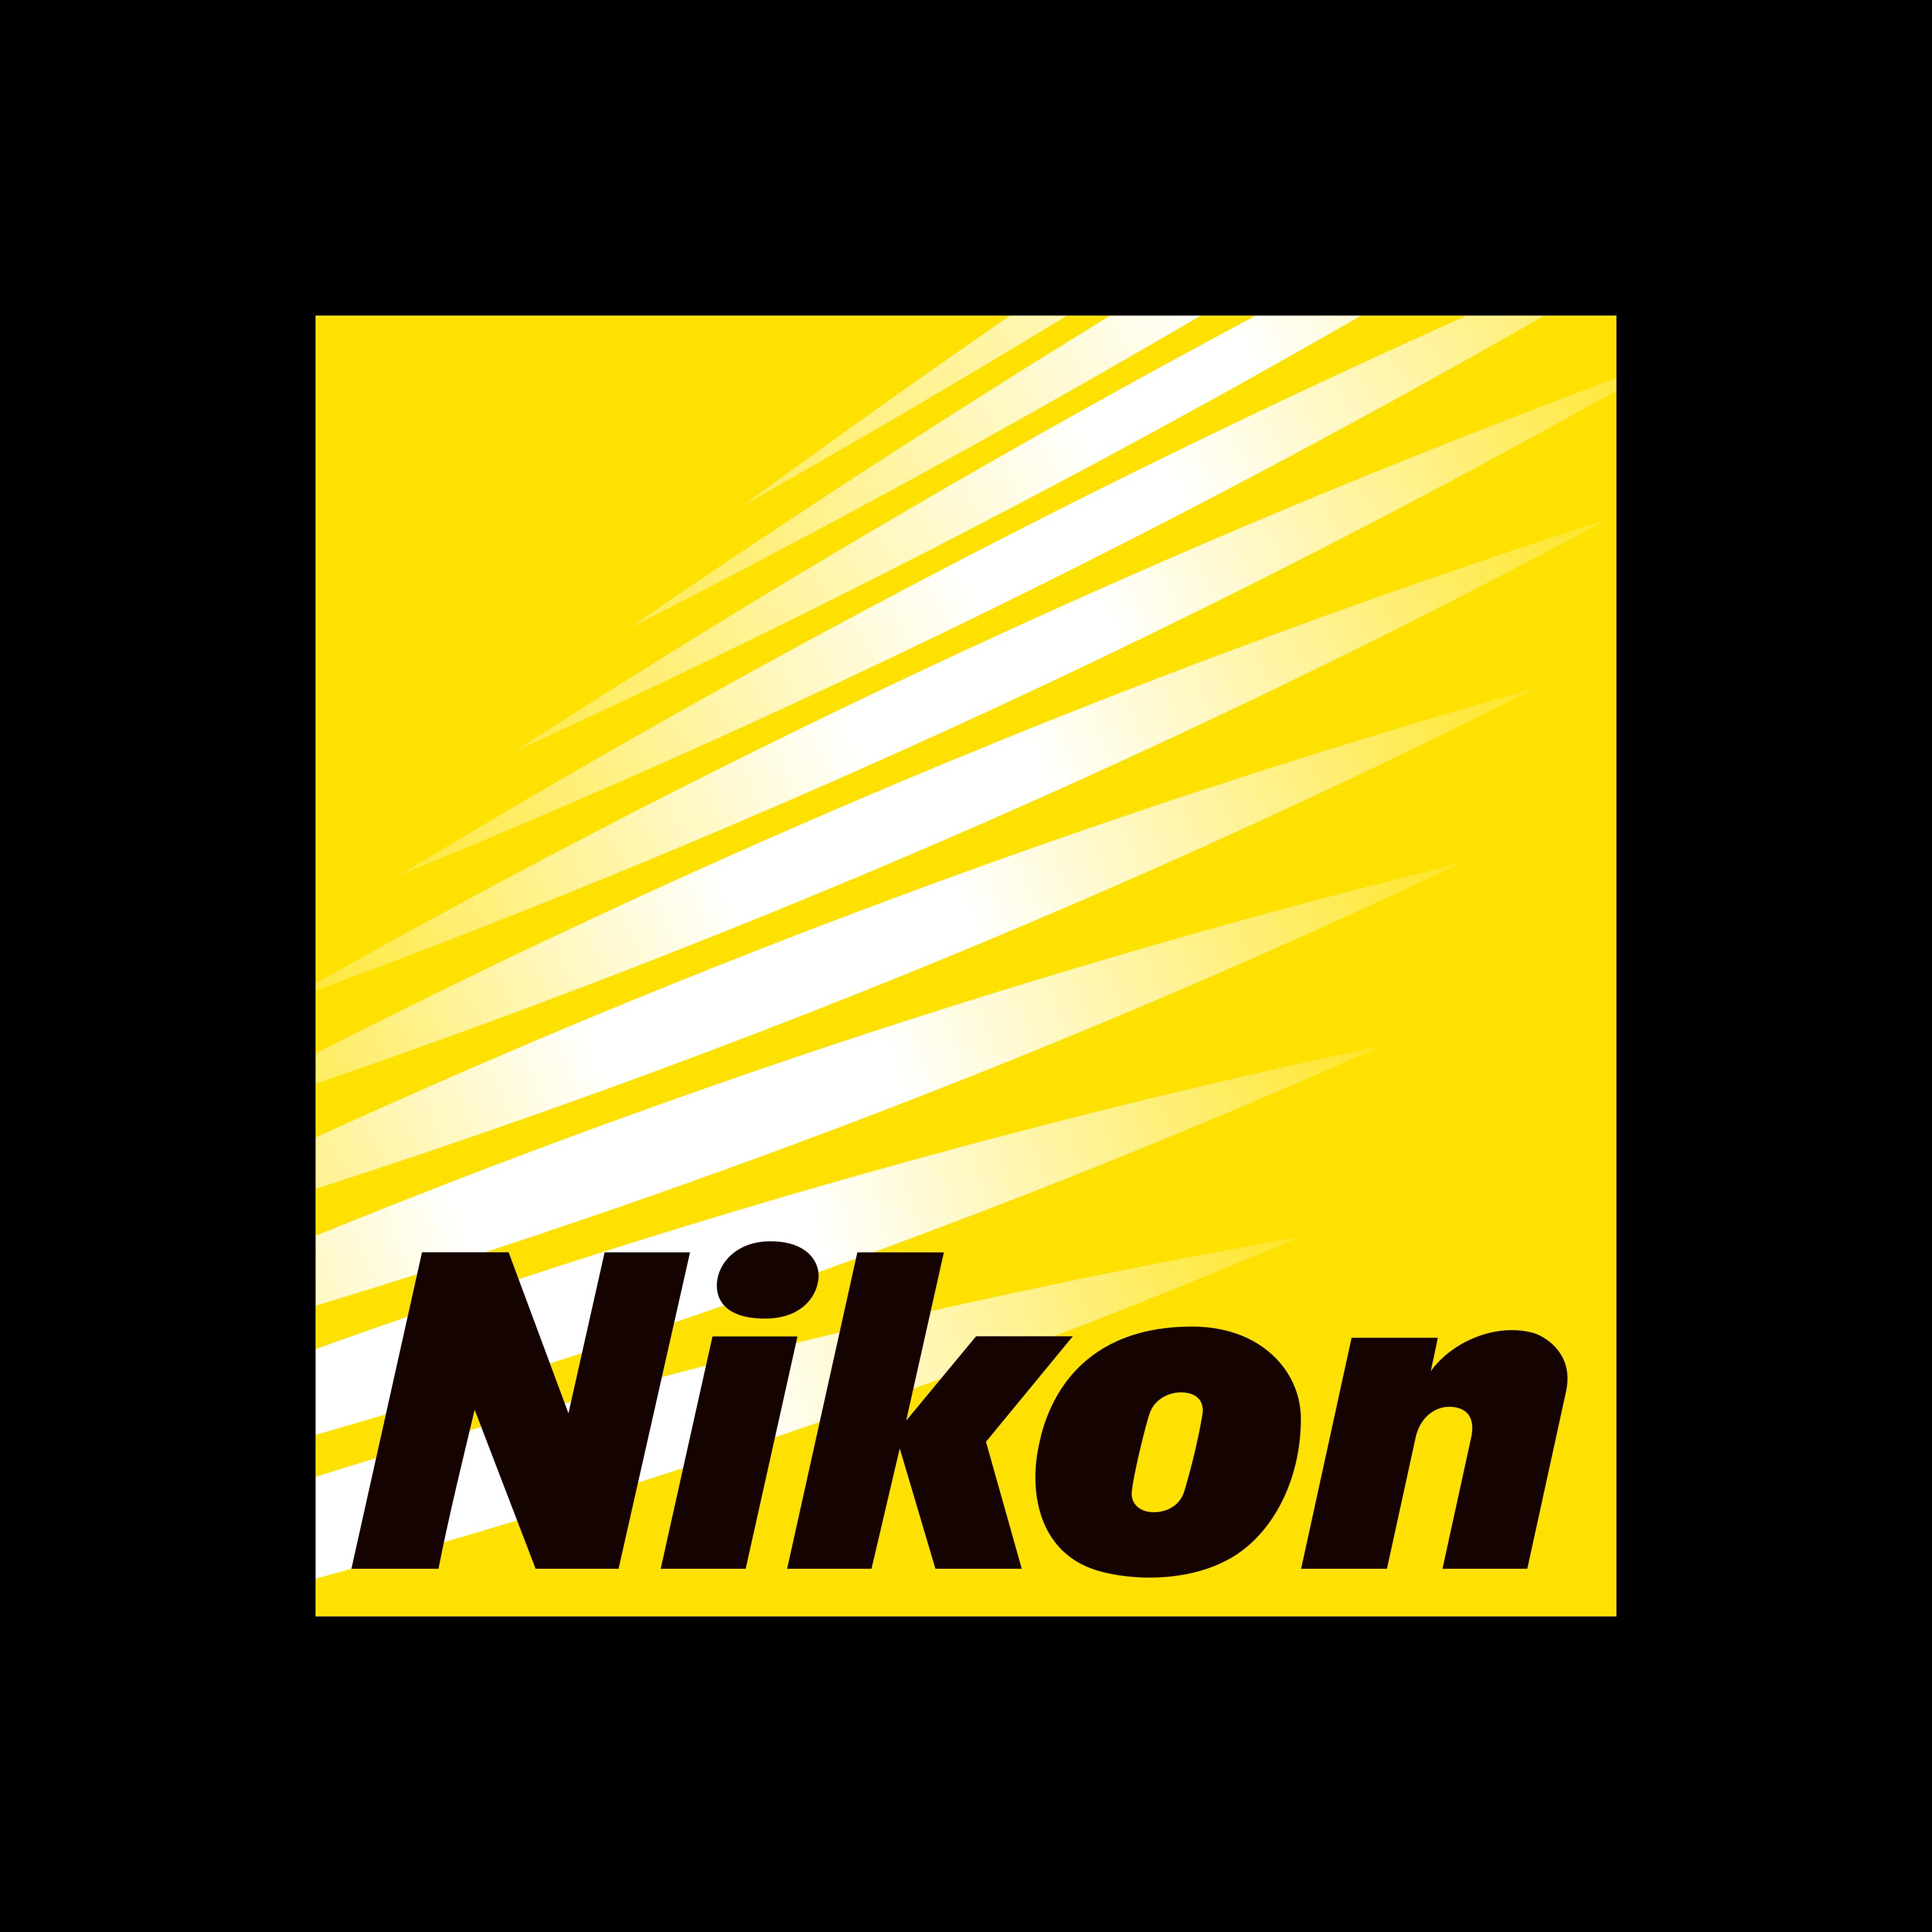 nikon logo 0 - Nikon Logo